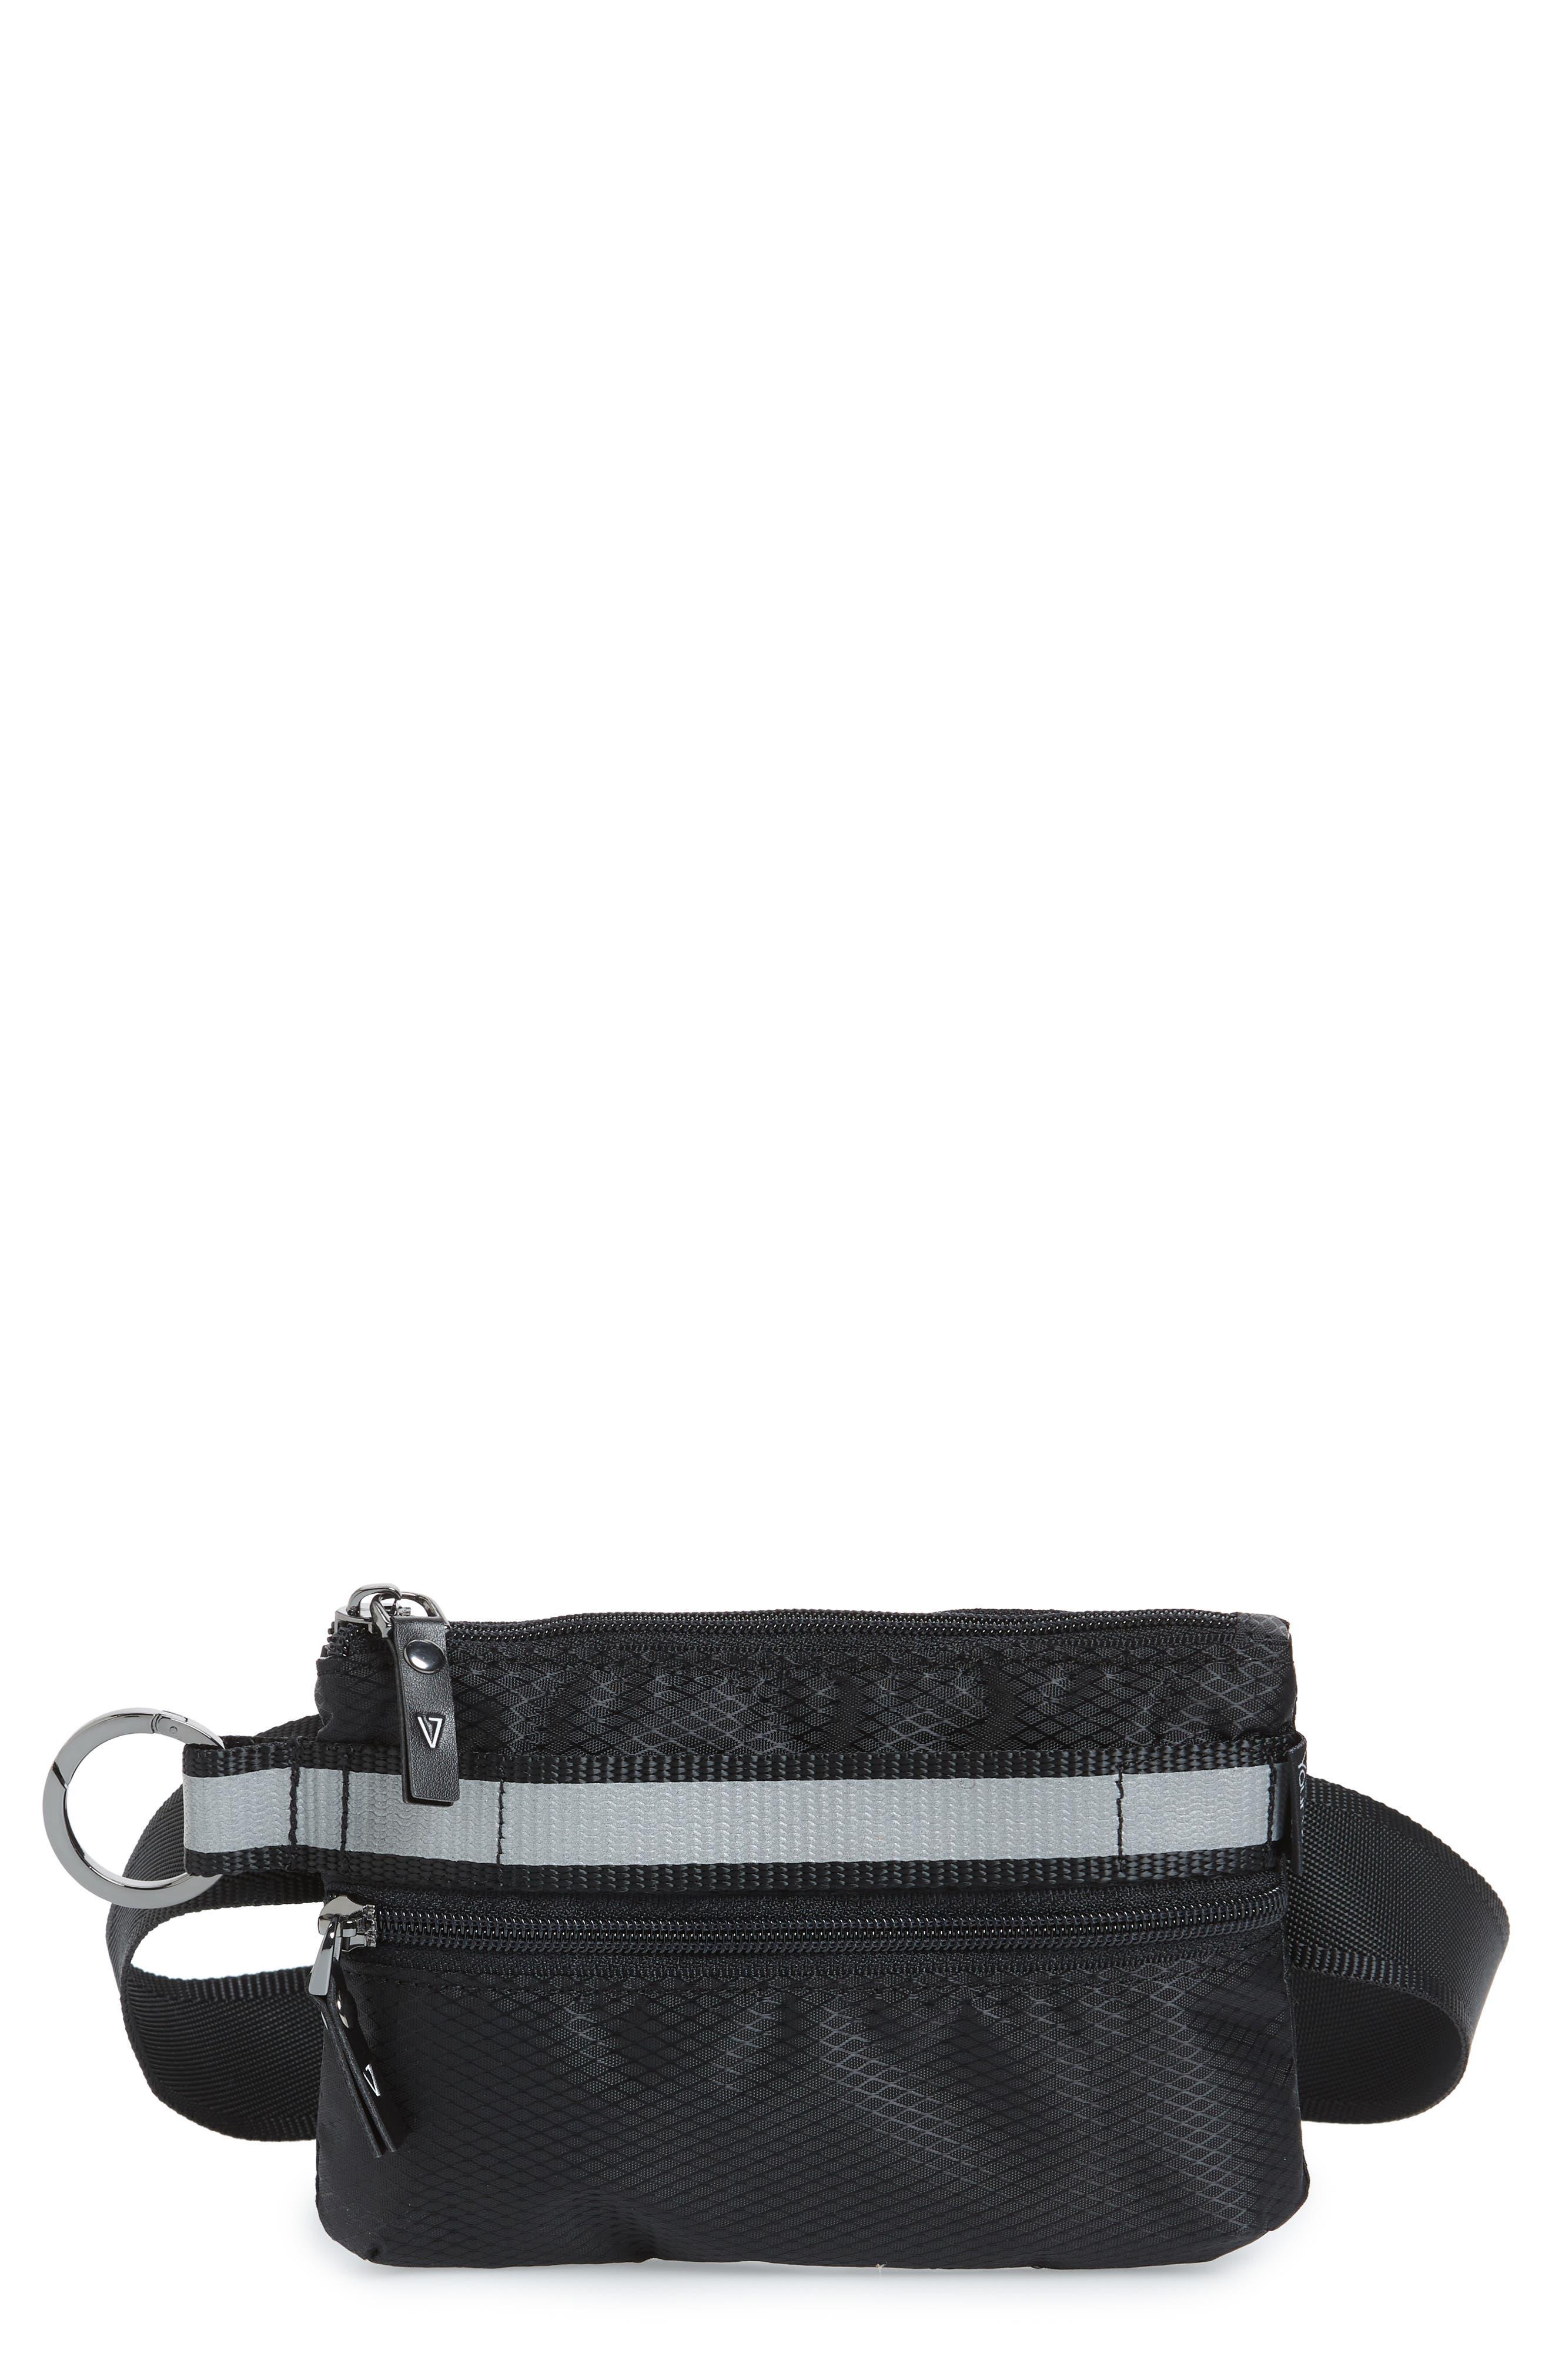 Urban Clutch Convertible Belt Bag,                         Main,                         color, BLACK/ REFLECTIVE STRIPE